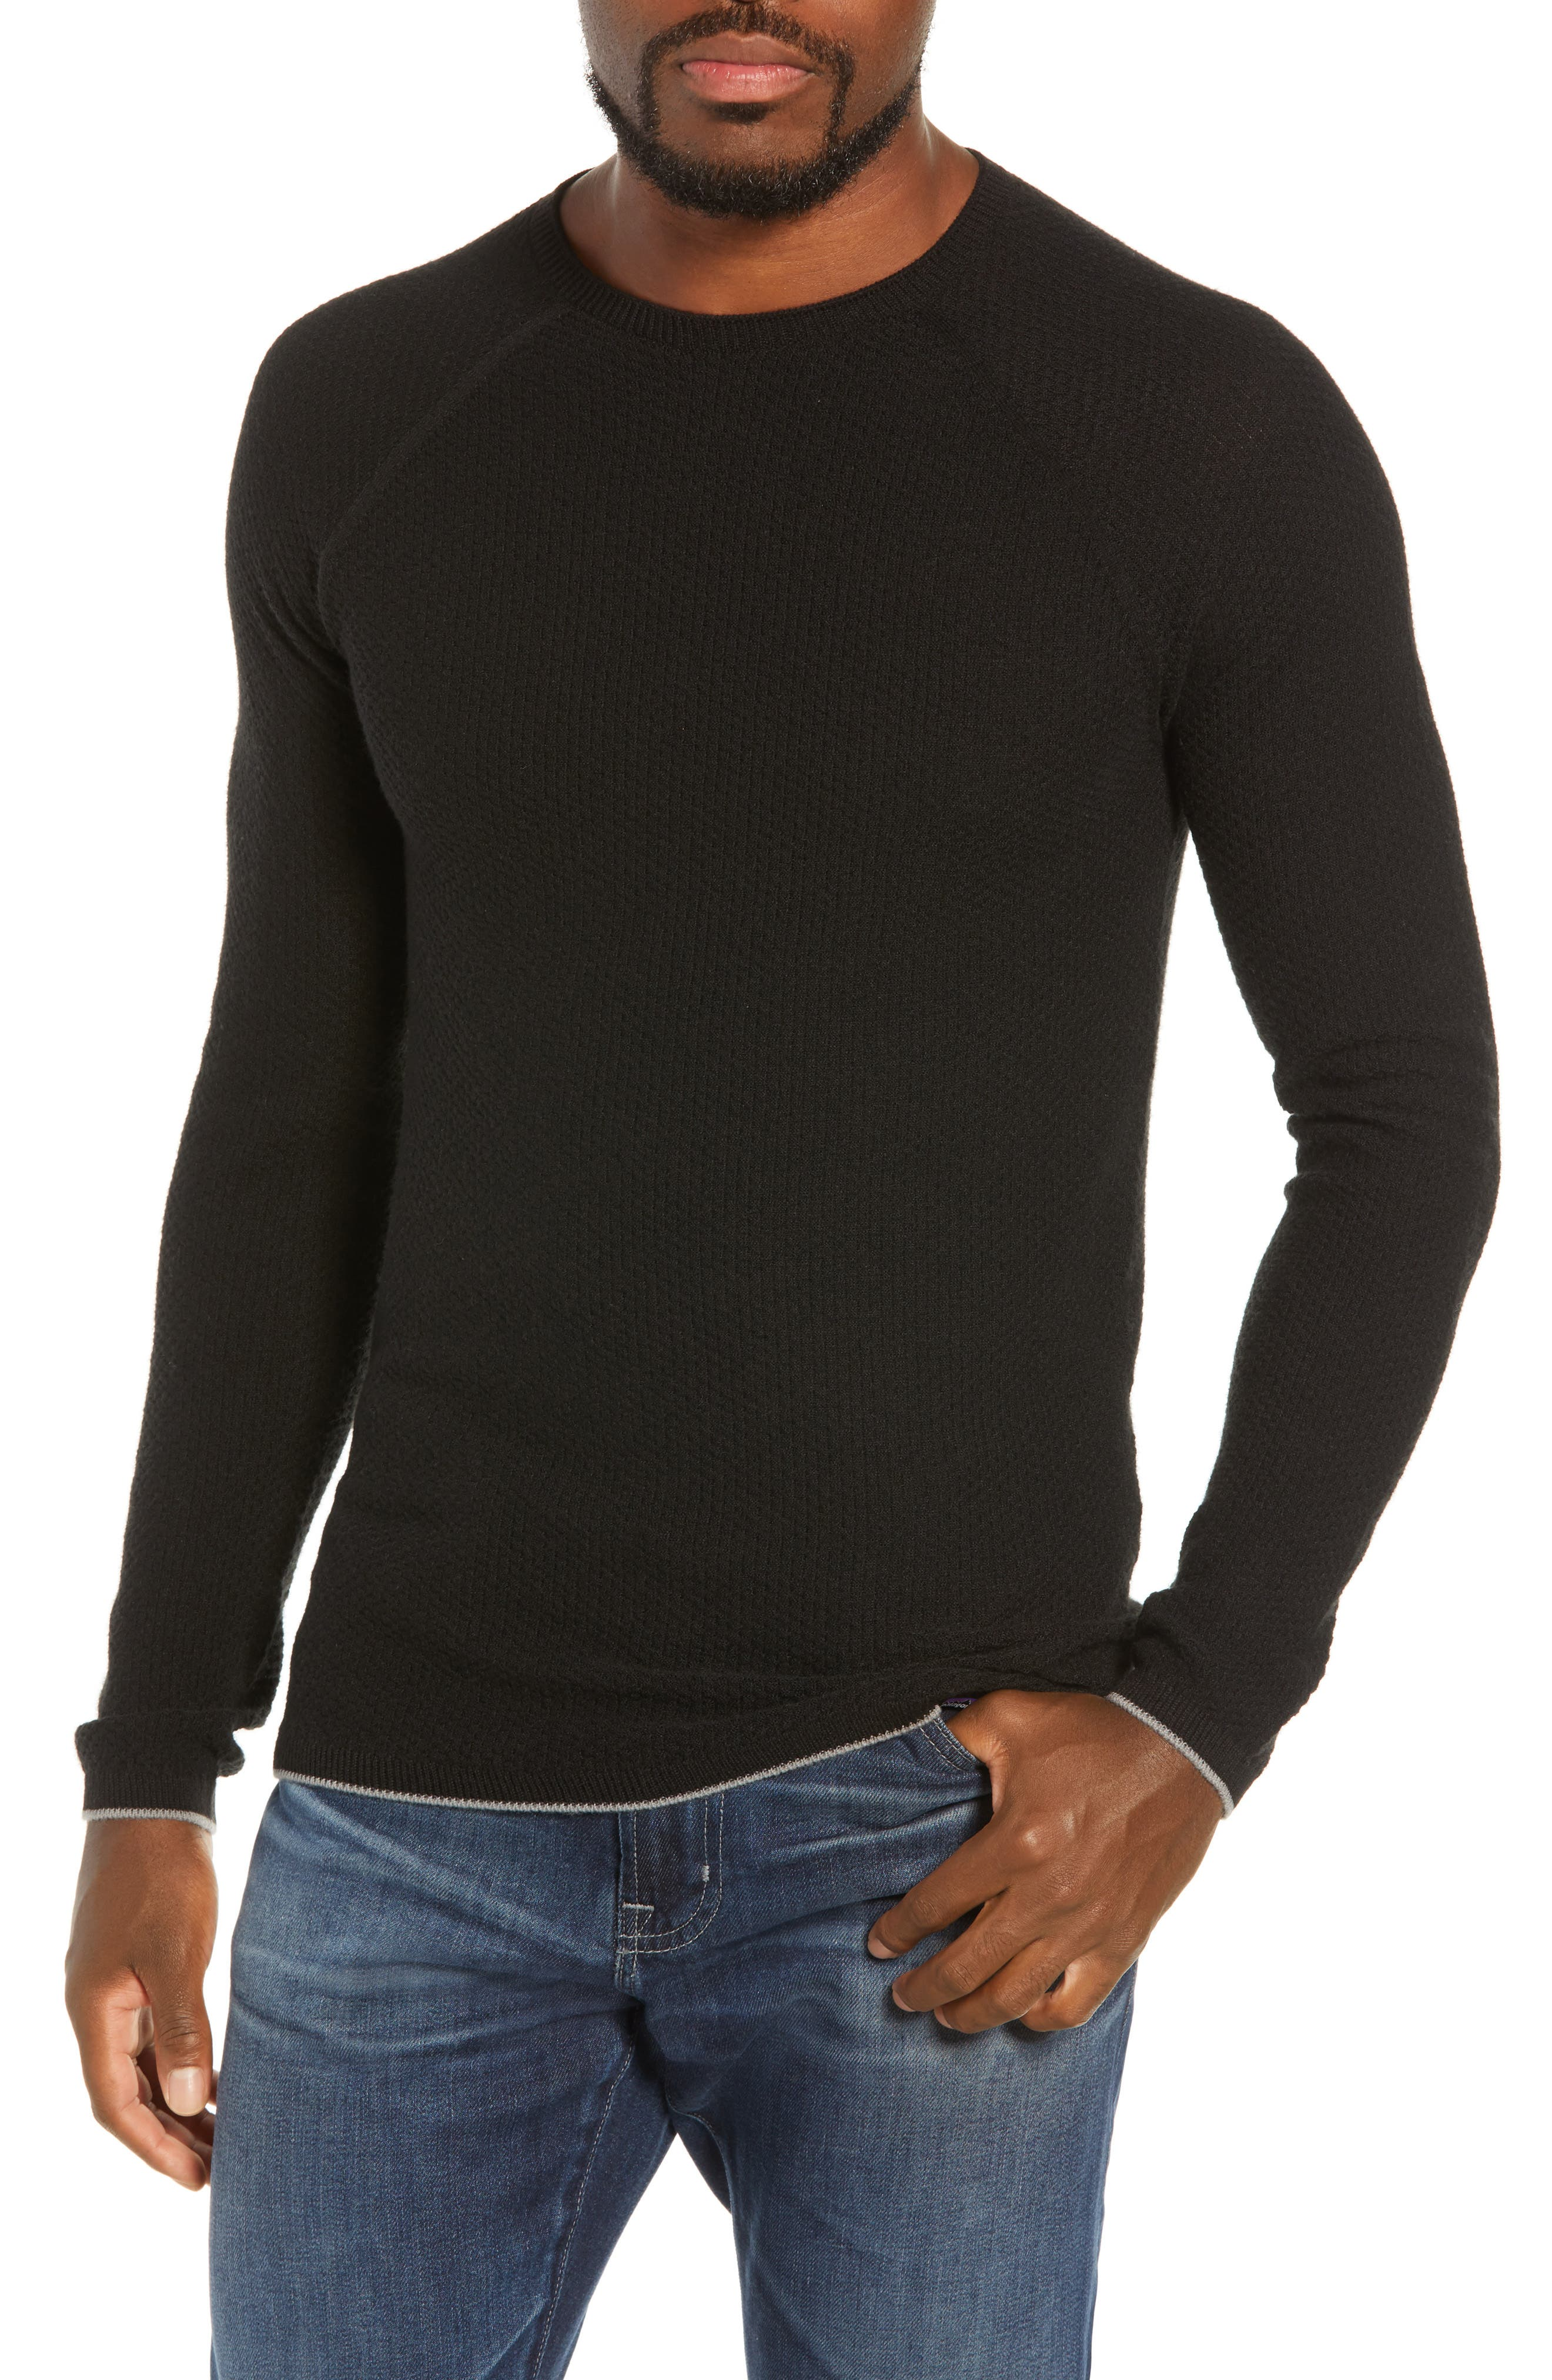 Capilene<sup>®</sup> Lightweight Air Crew Sweater,                             Main thumbnail 1, color,                             BLACK